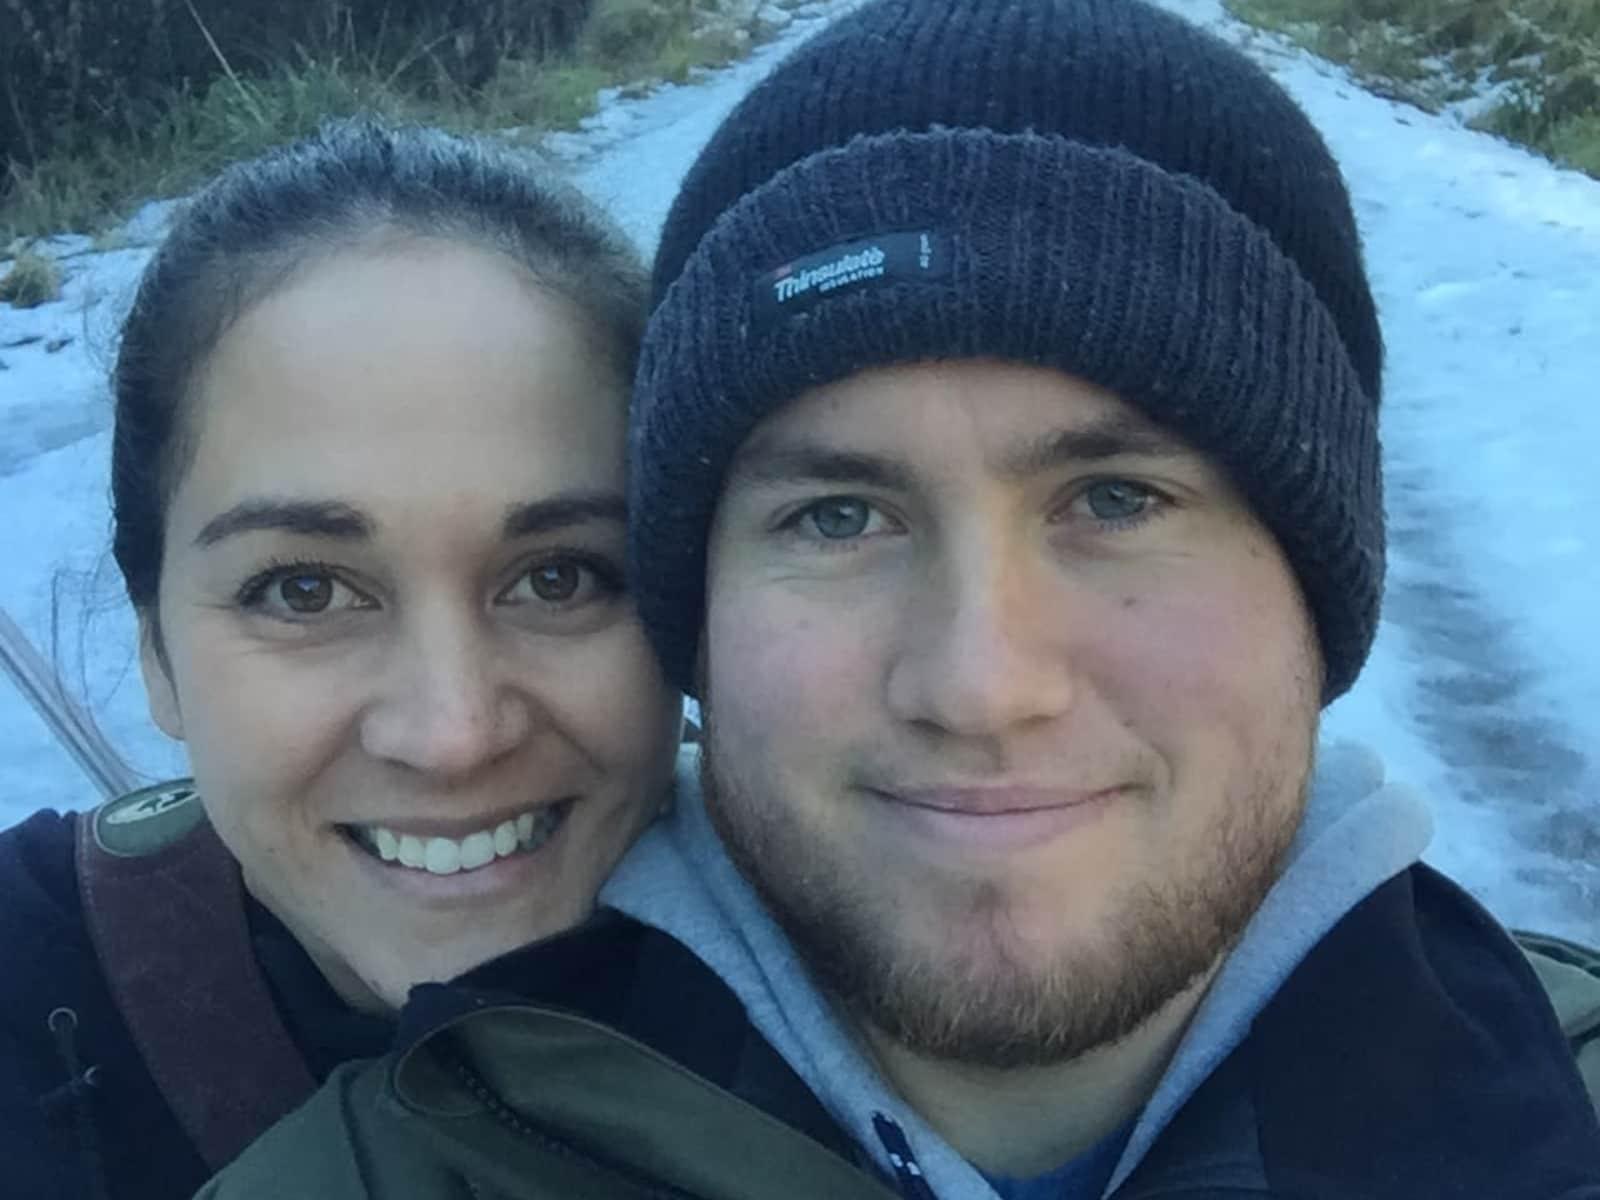 Amanda & Nick from Napier, New Zealand